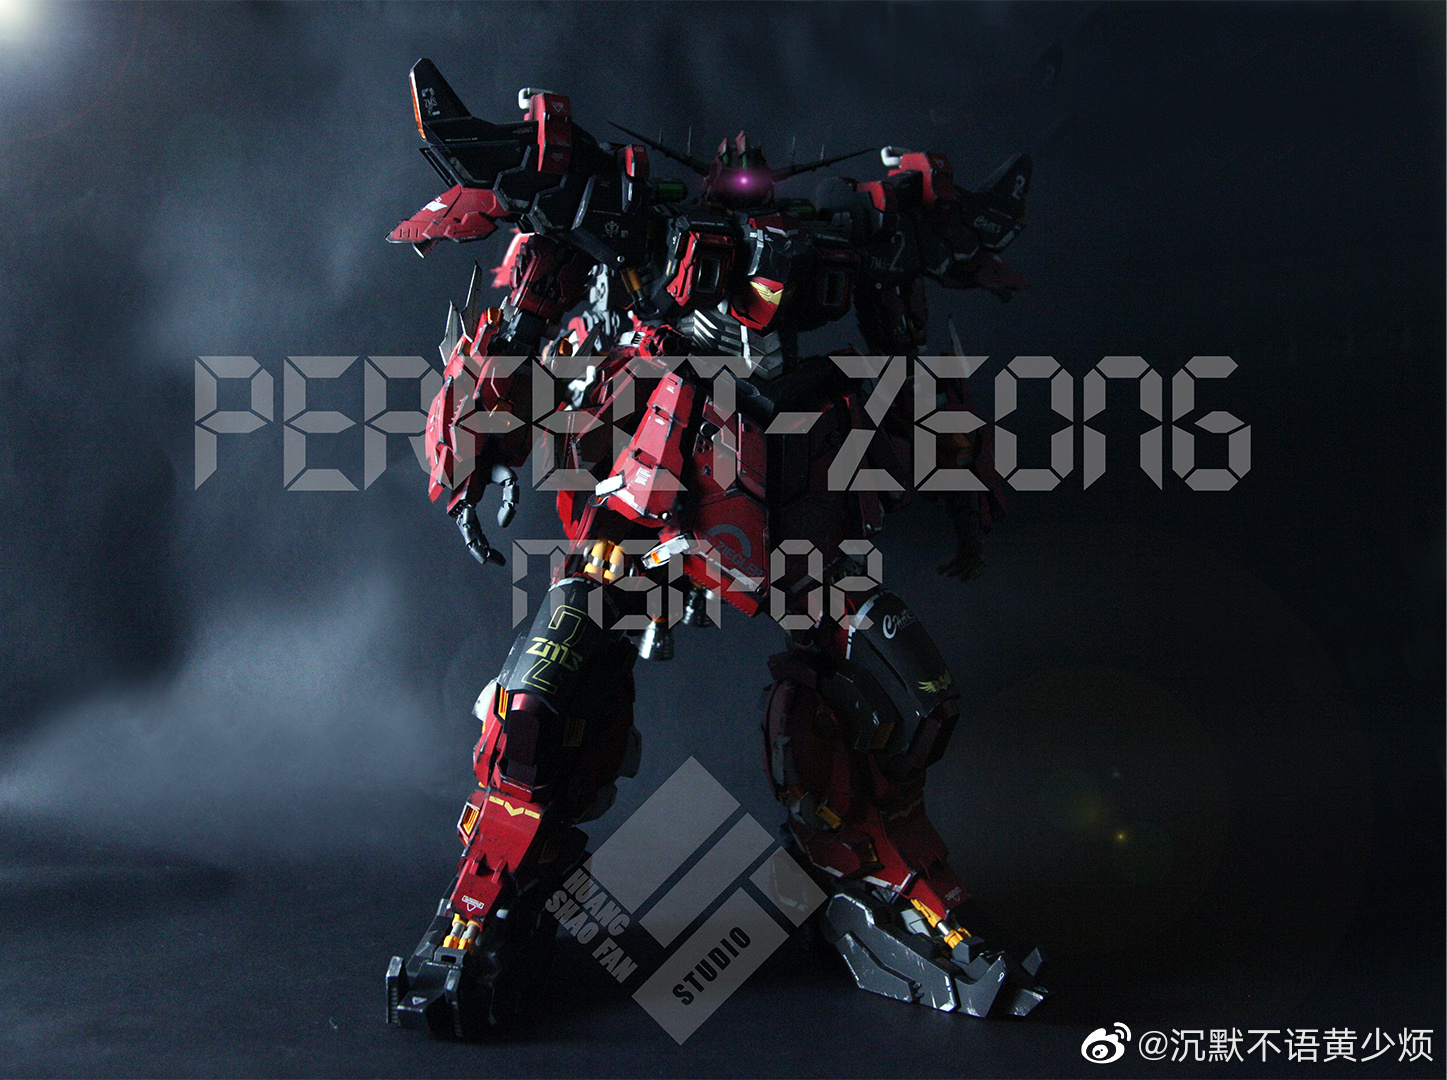 S164_2_mc_perfect_zeong_red_001.jpg